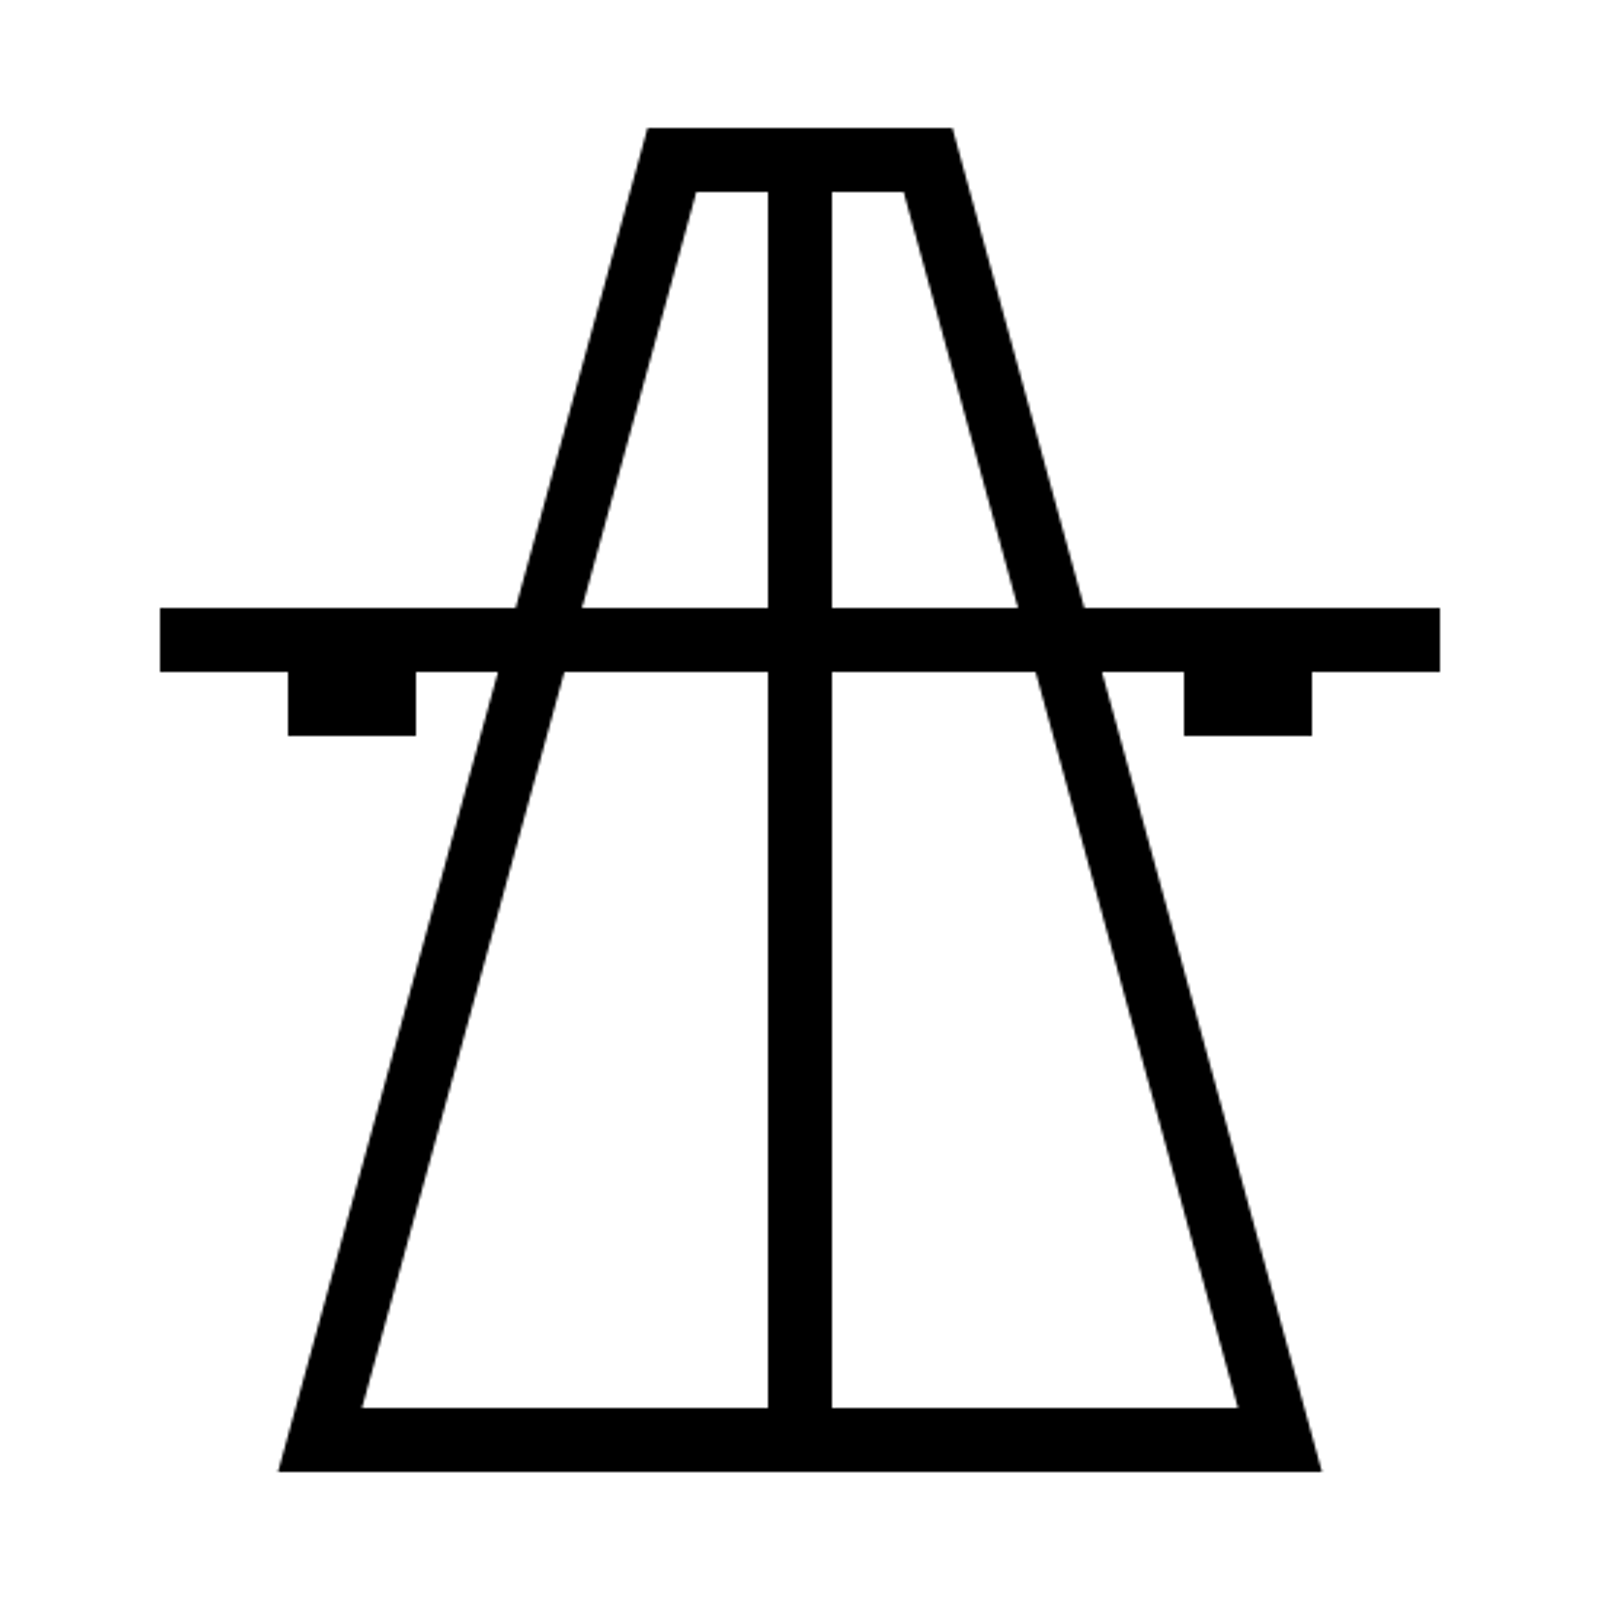 Autopista icon